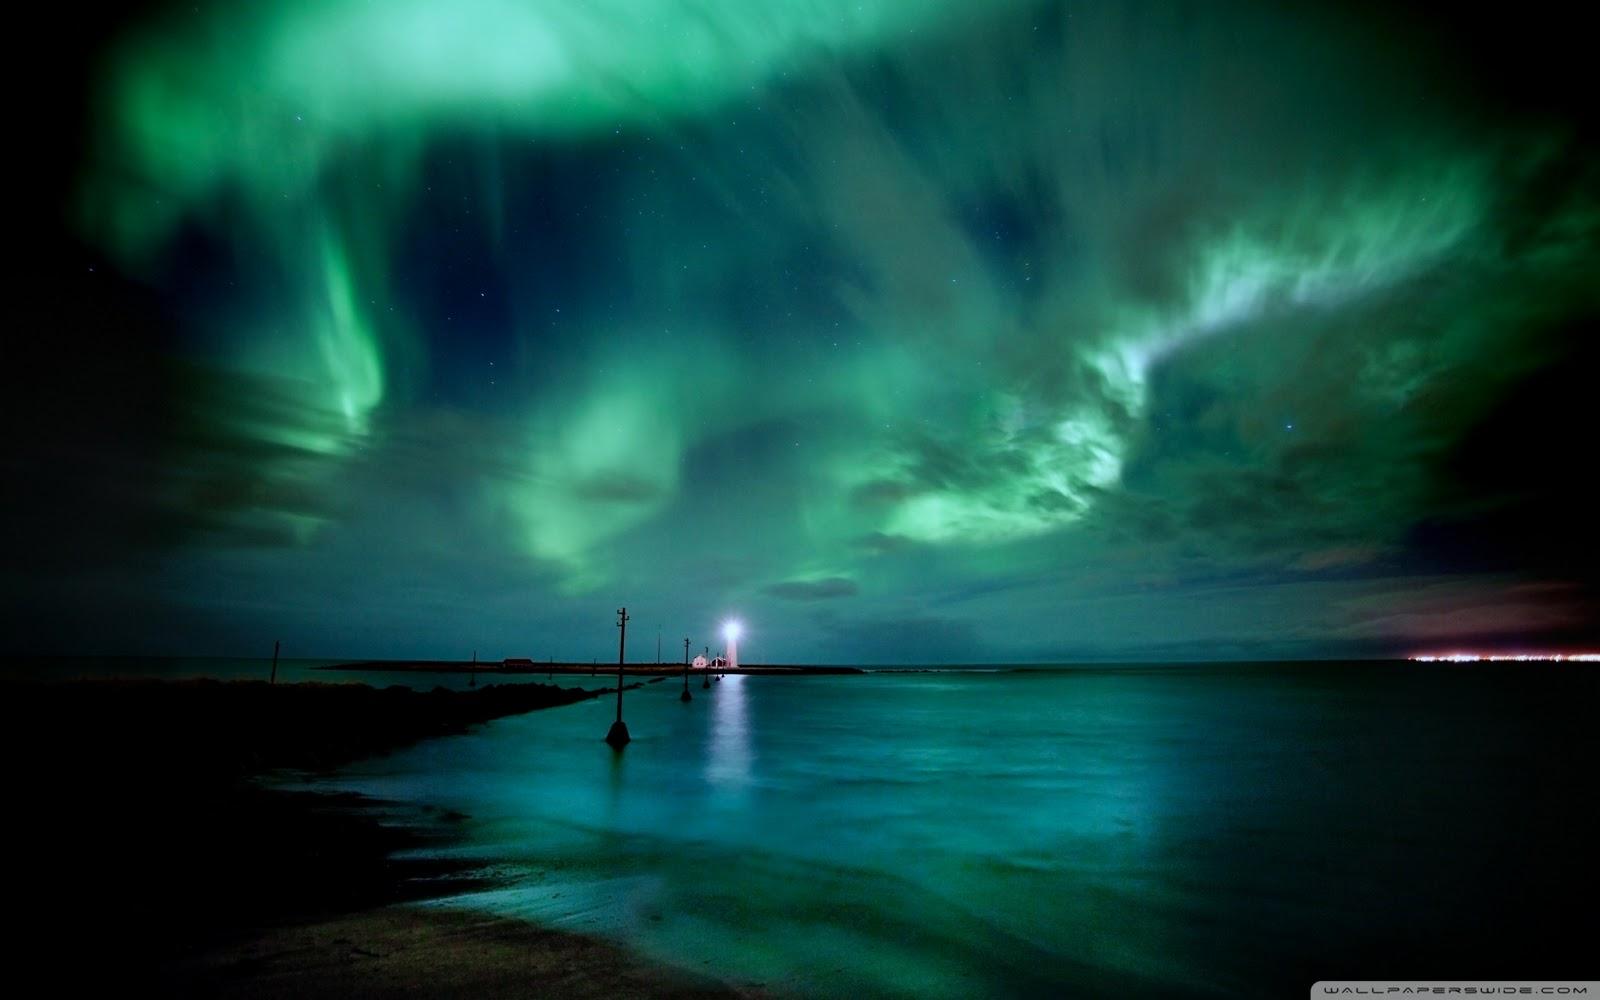 http://3.bp.blogspot.com/-47AR9SPozQA/TvD7WtgJUzI/AAAAAAAAATs/sdOV0DJNZwY/s1600/aurora-borealis-wallpaper.jpg